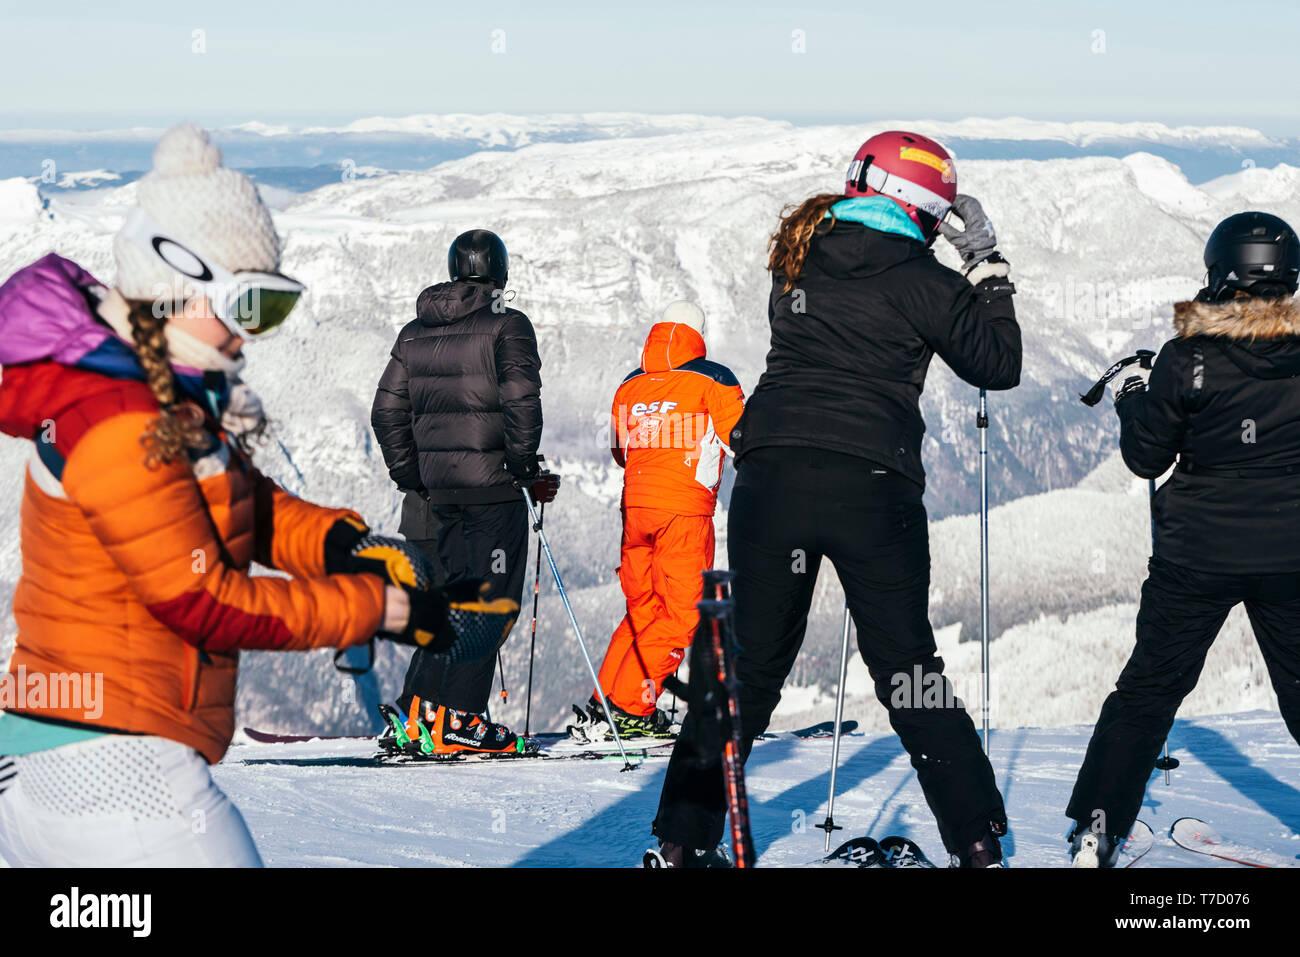 French ski school ESF ski instructor, ski resort of La Clusaz (central-eastern France). Ski instructor and learners atop a ski run Stock Photo